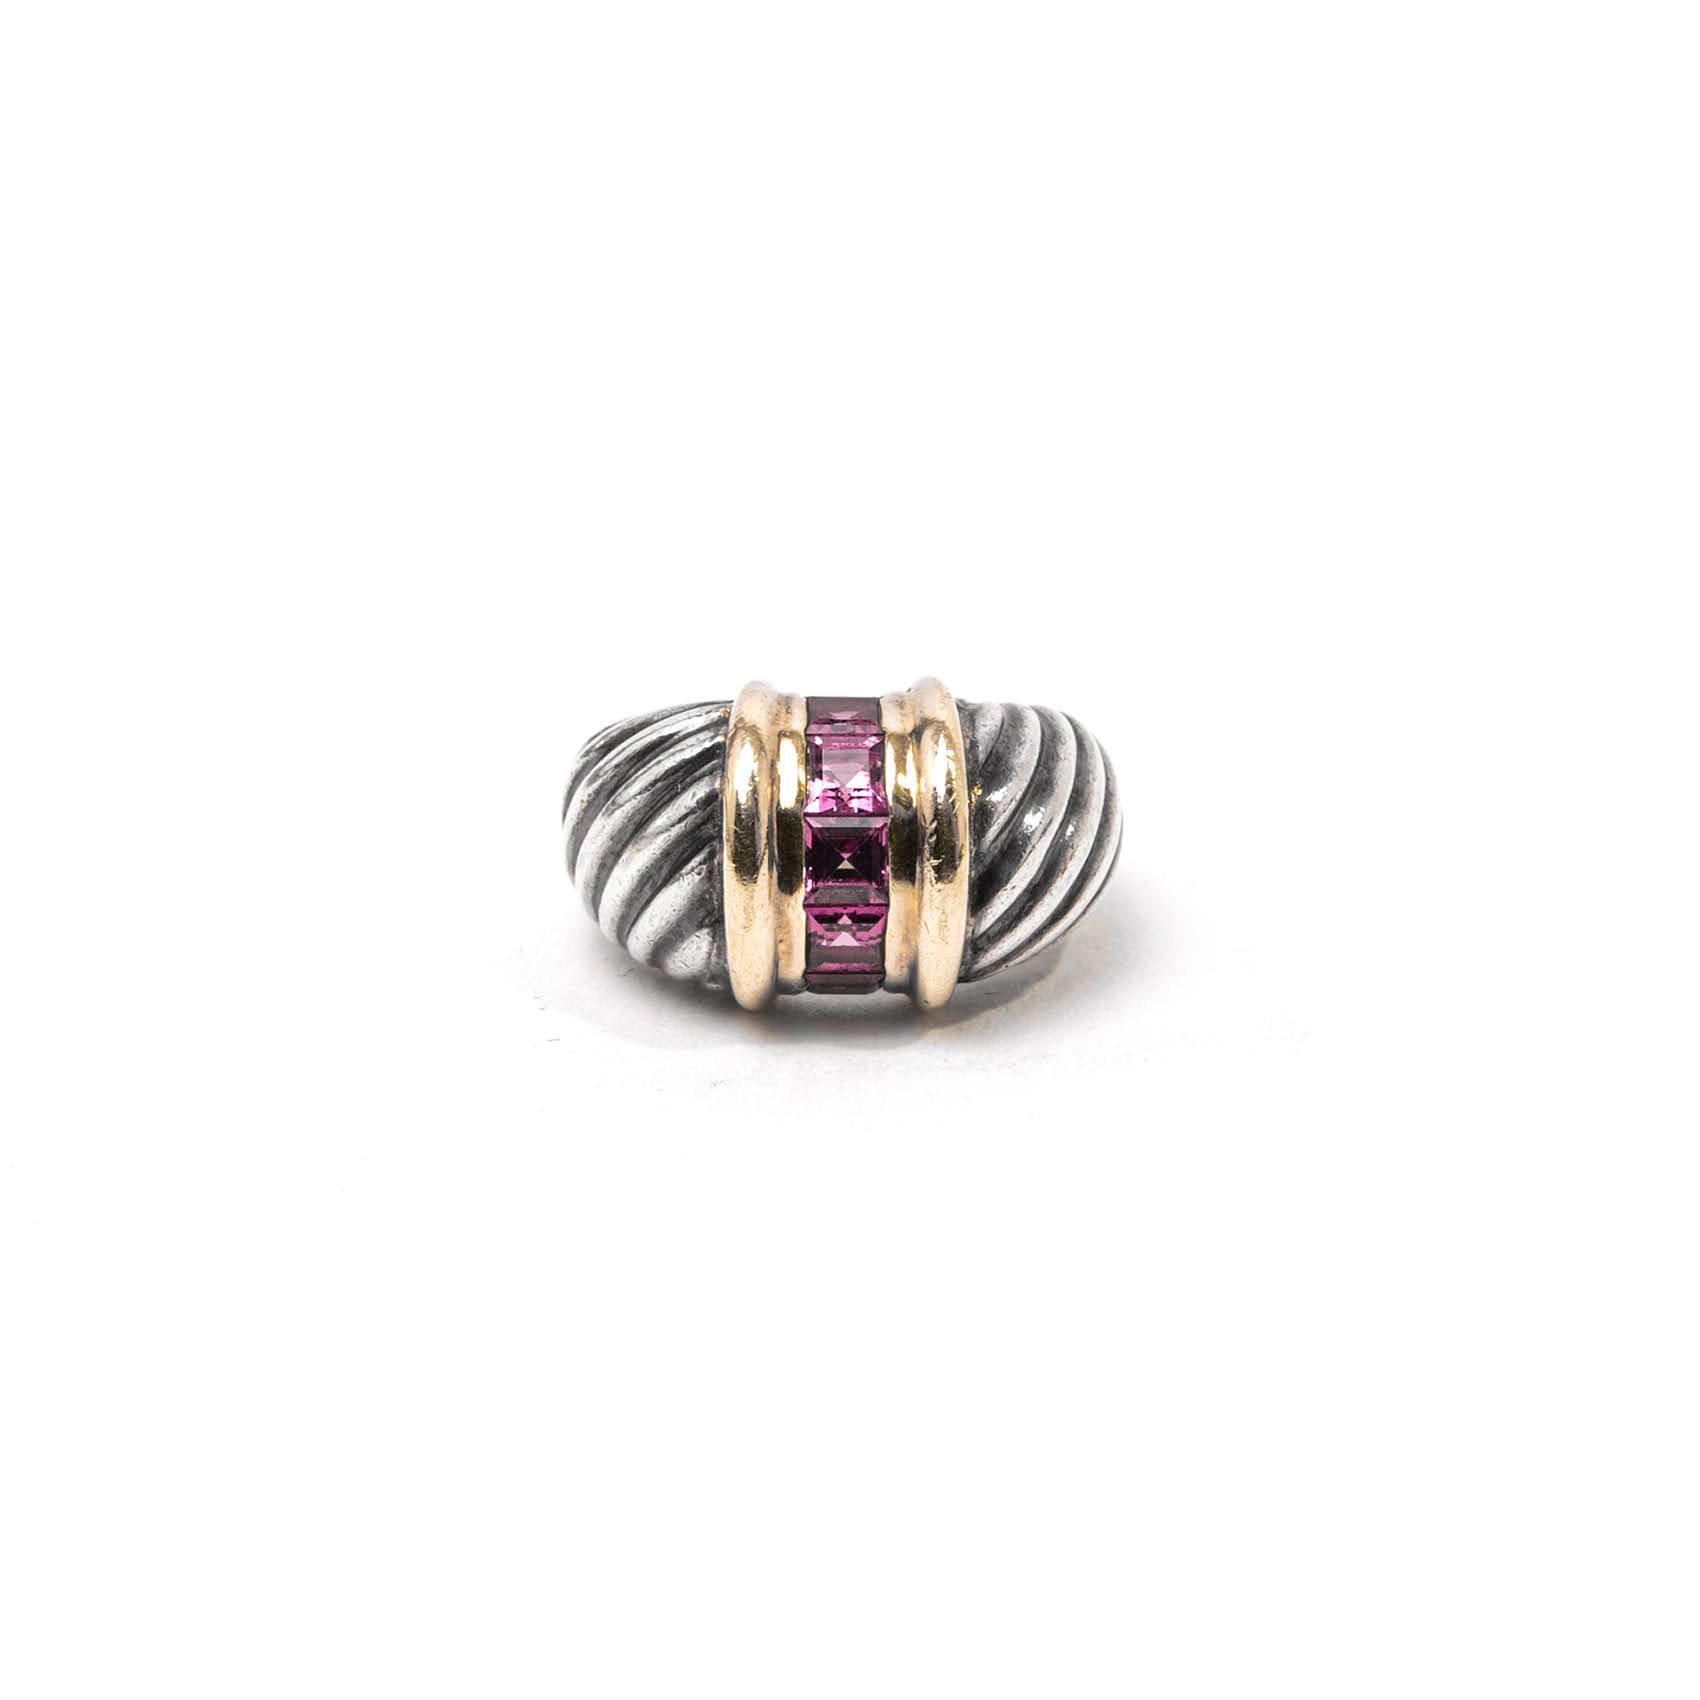 David Yurman Size 4.5 14k Cable Garnet Ring